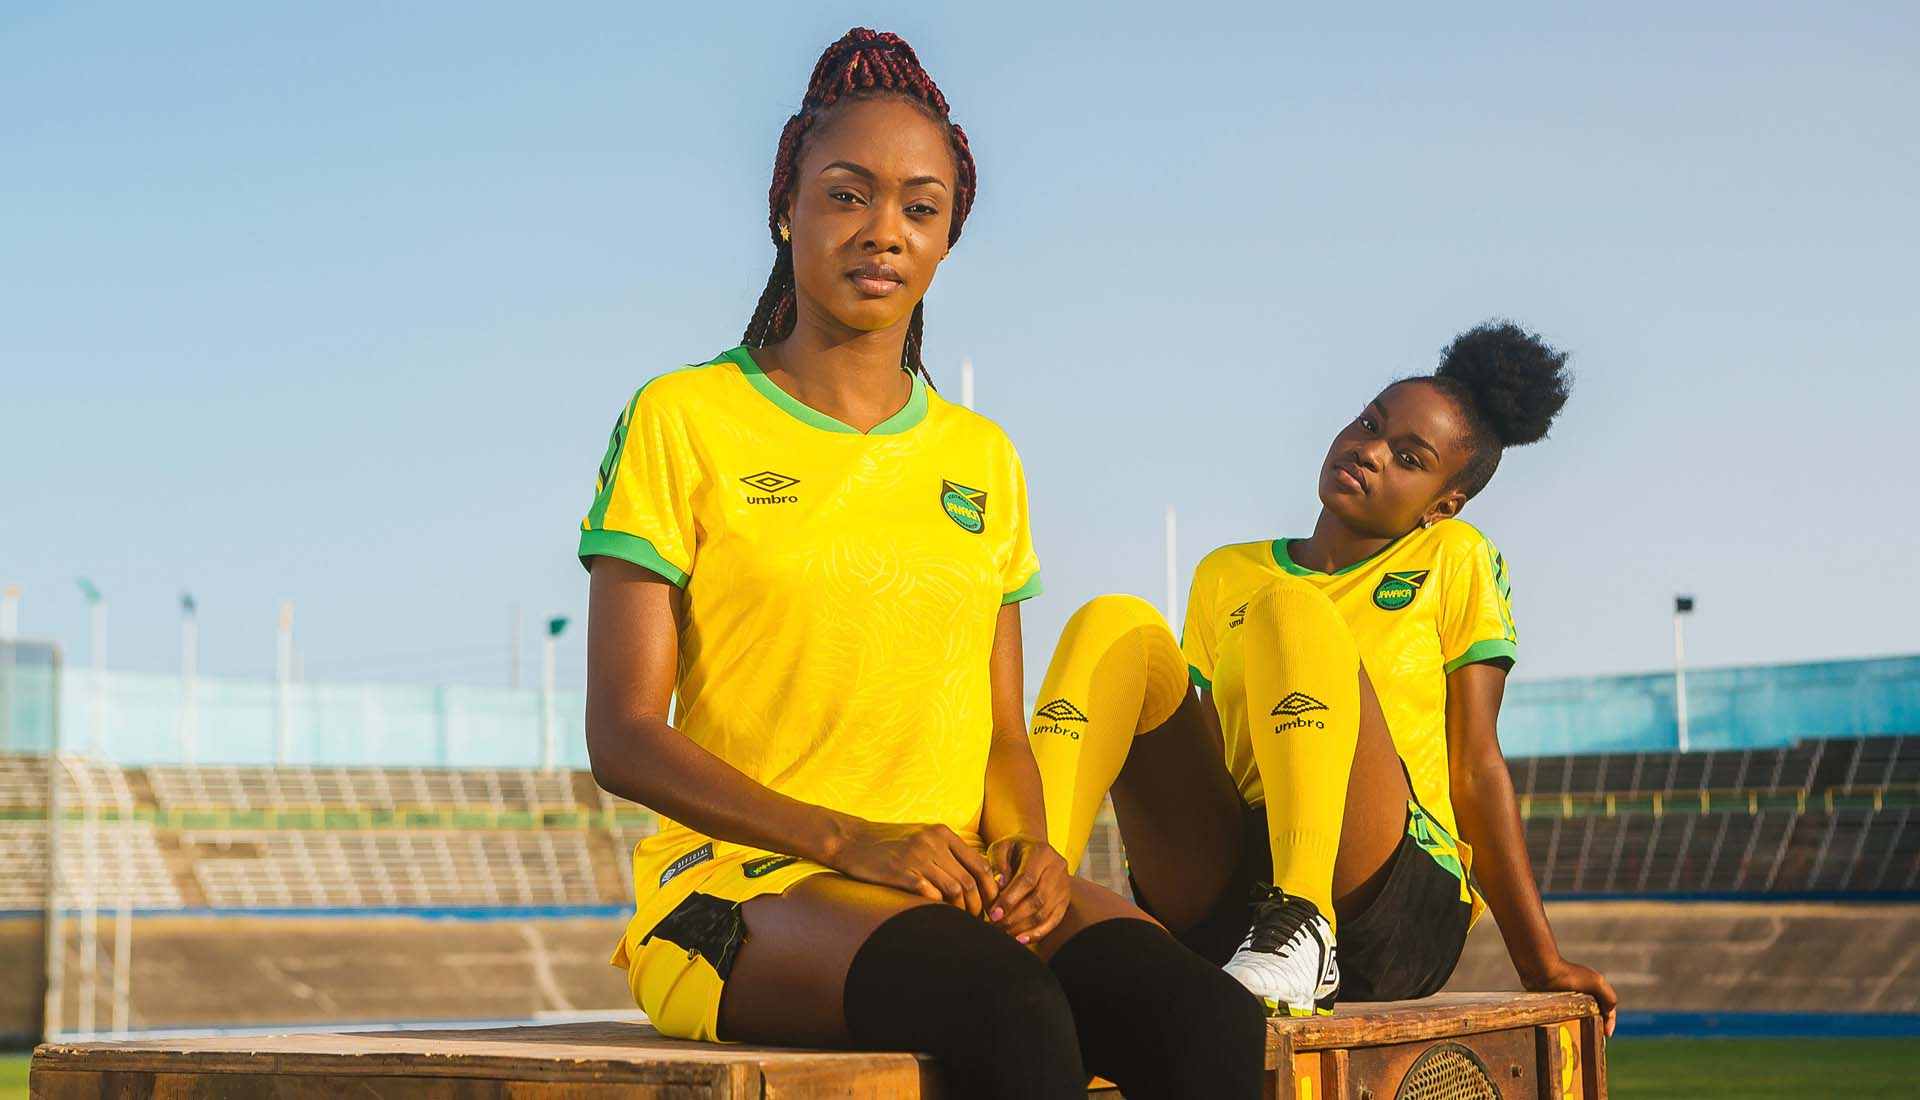 umbro jamaica soccer jersey